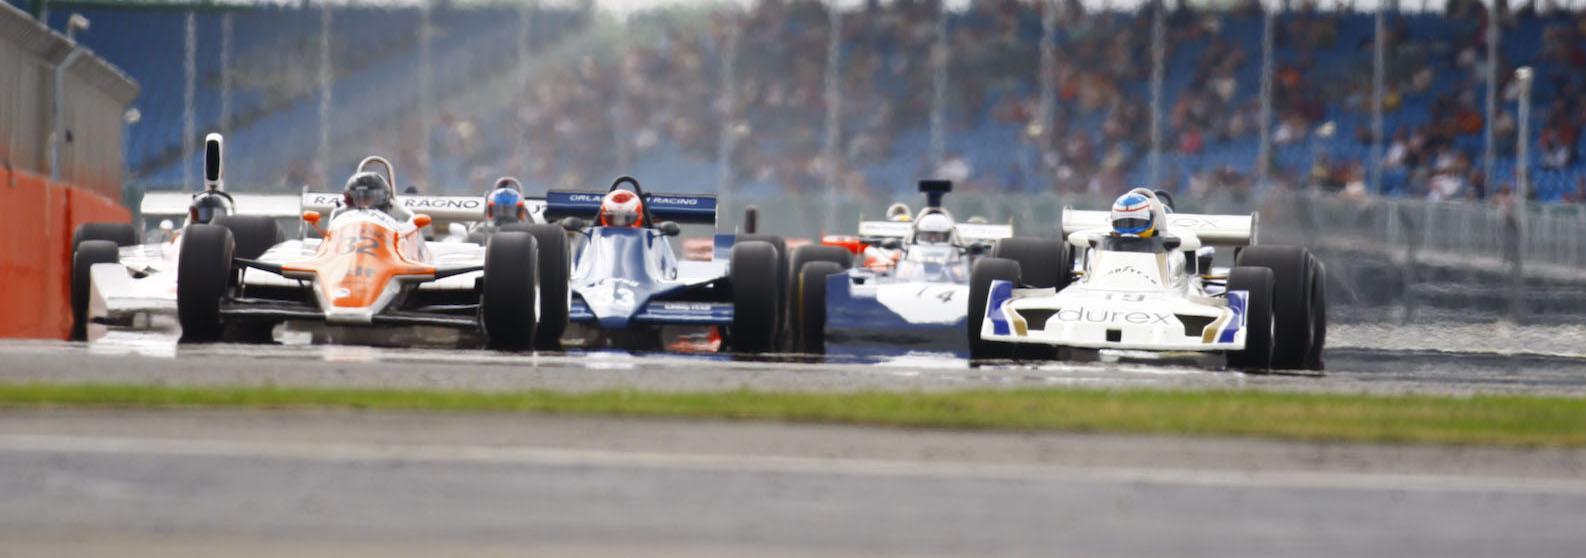 Historic F1 races to support 2018 British Grand Prix